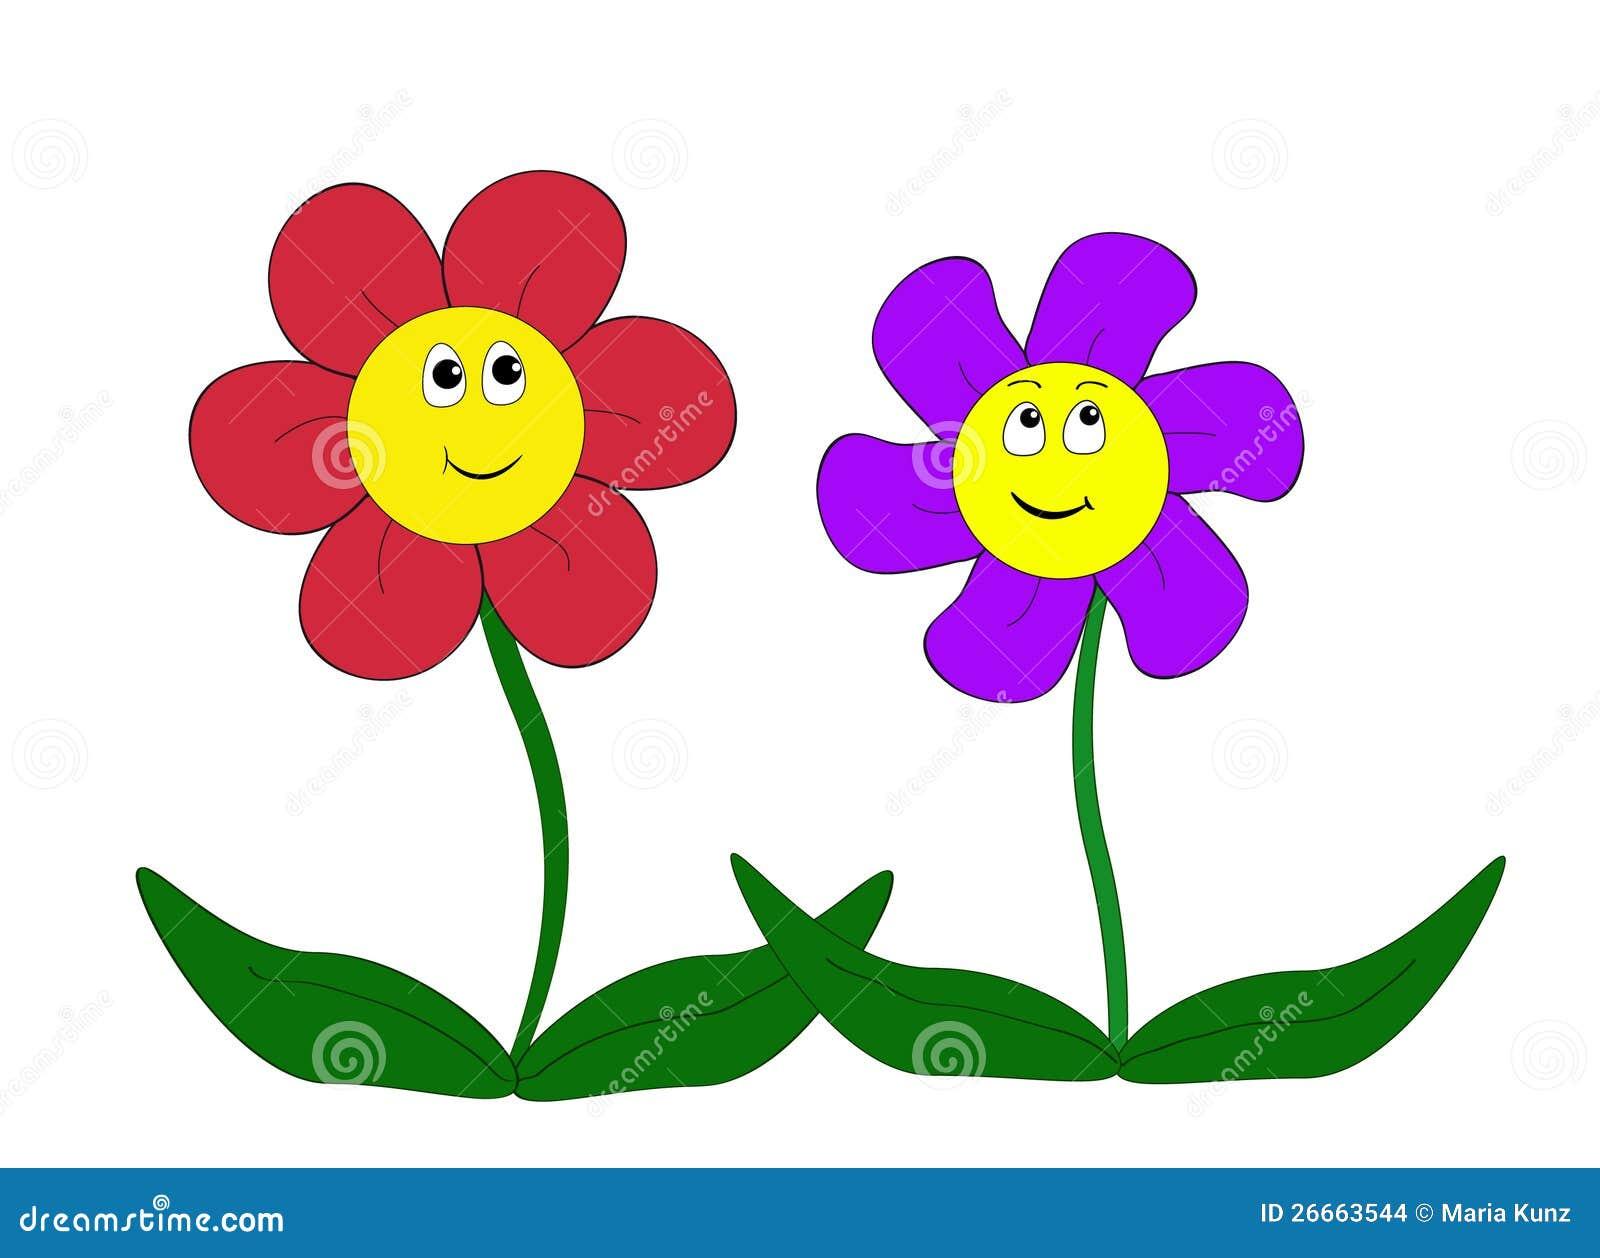 Cartoon Flowers Stock Image